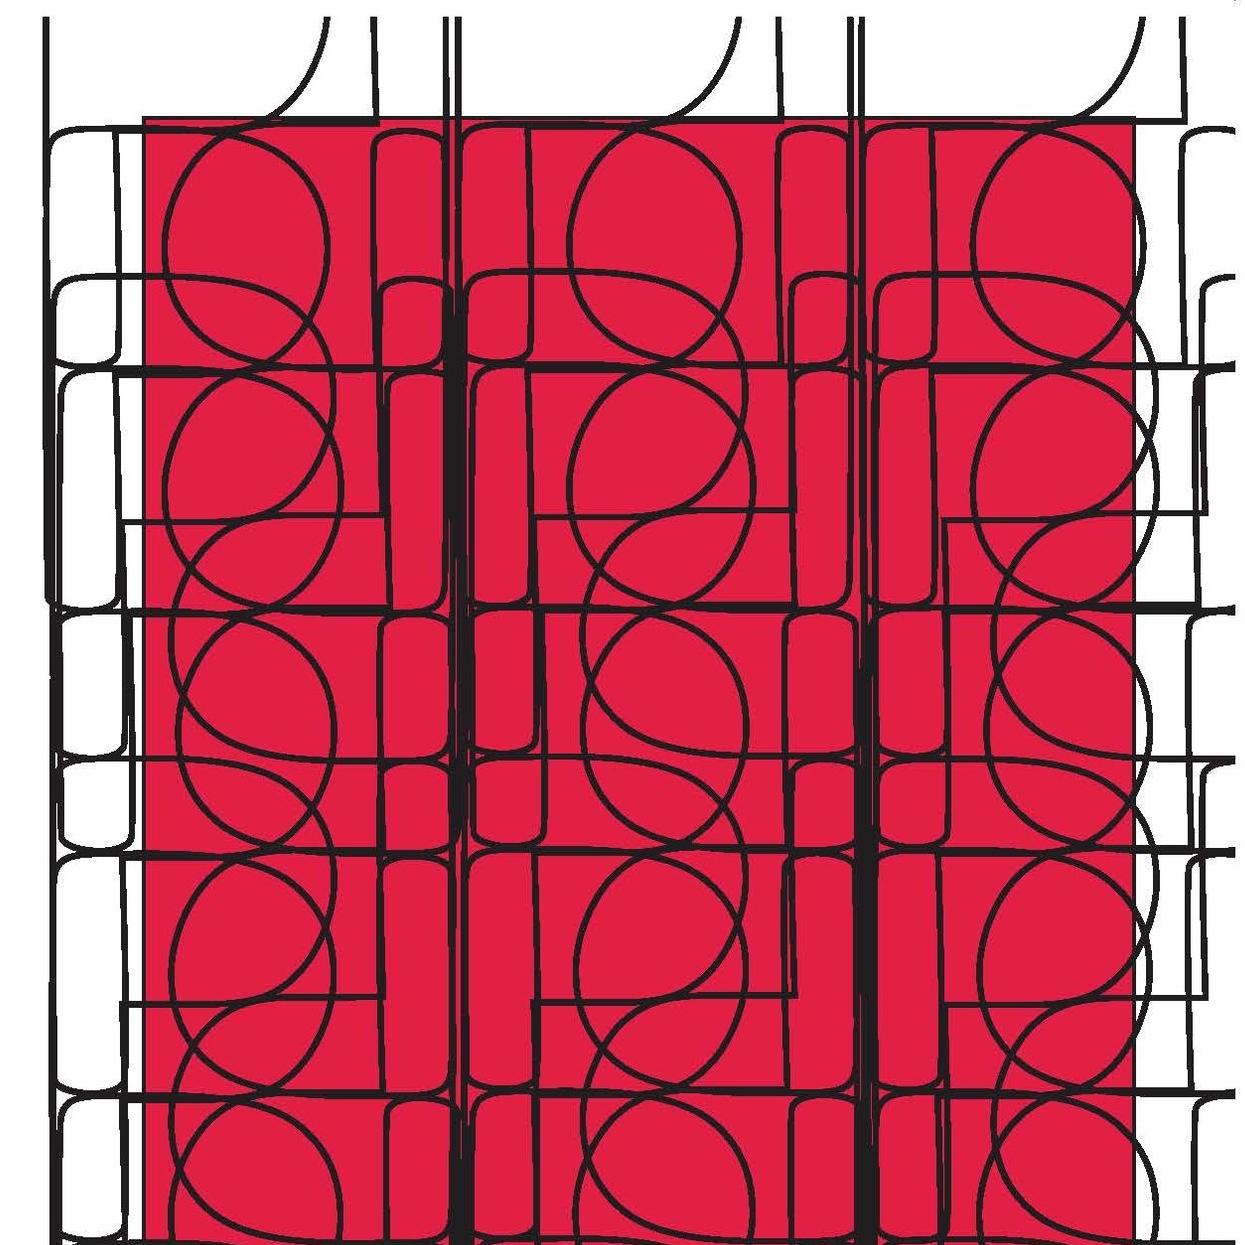 iconbook_pattern.jpg